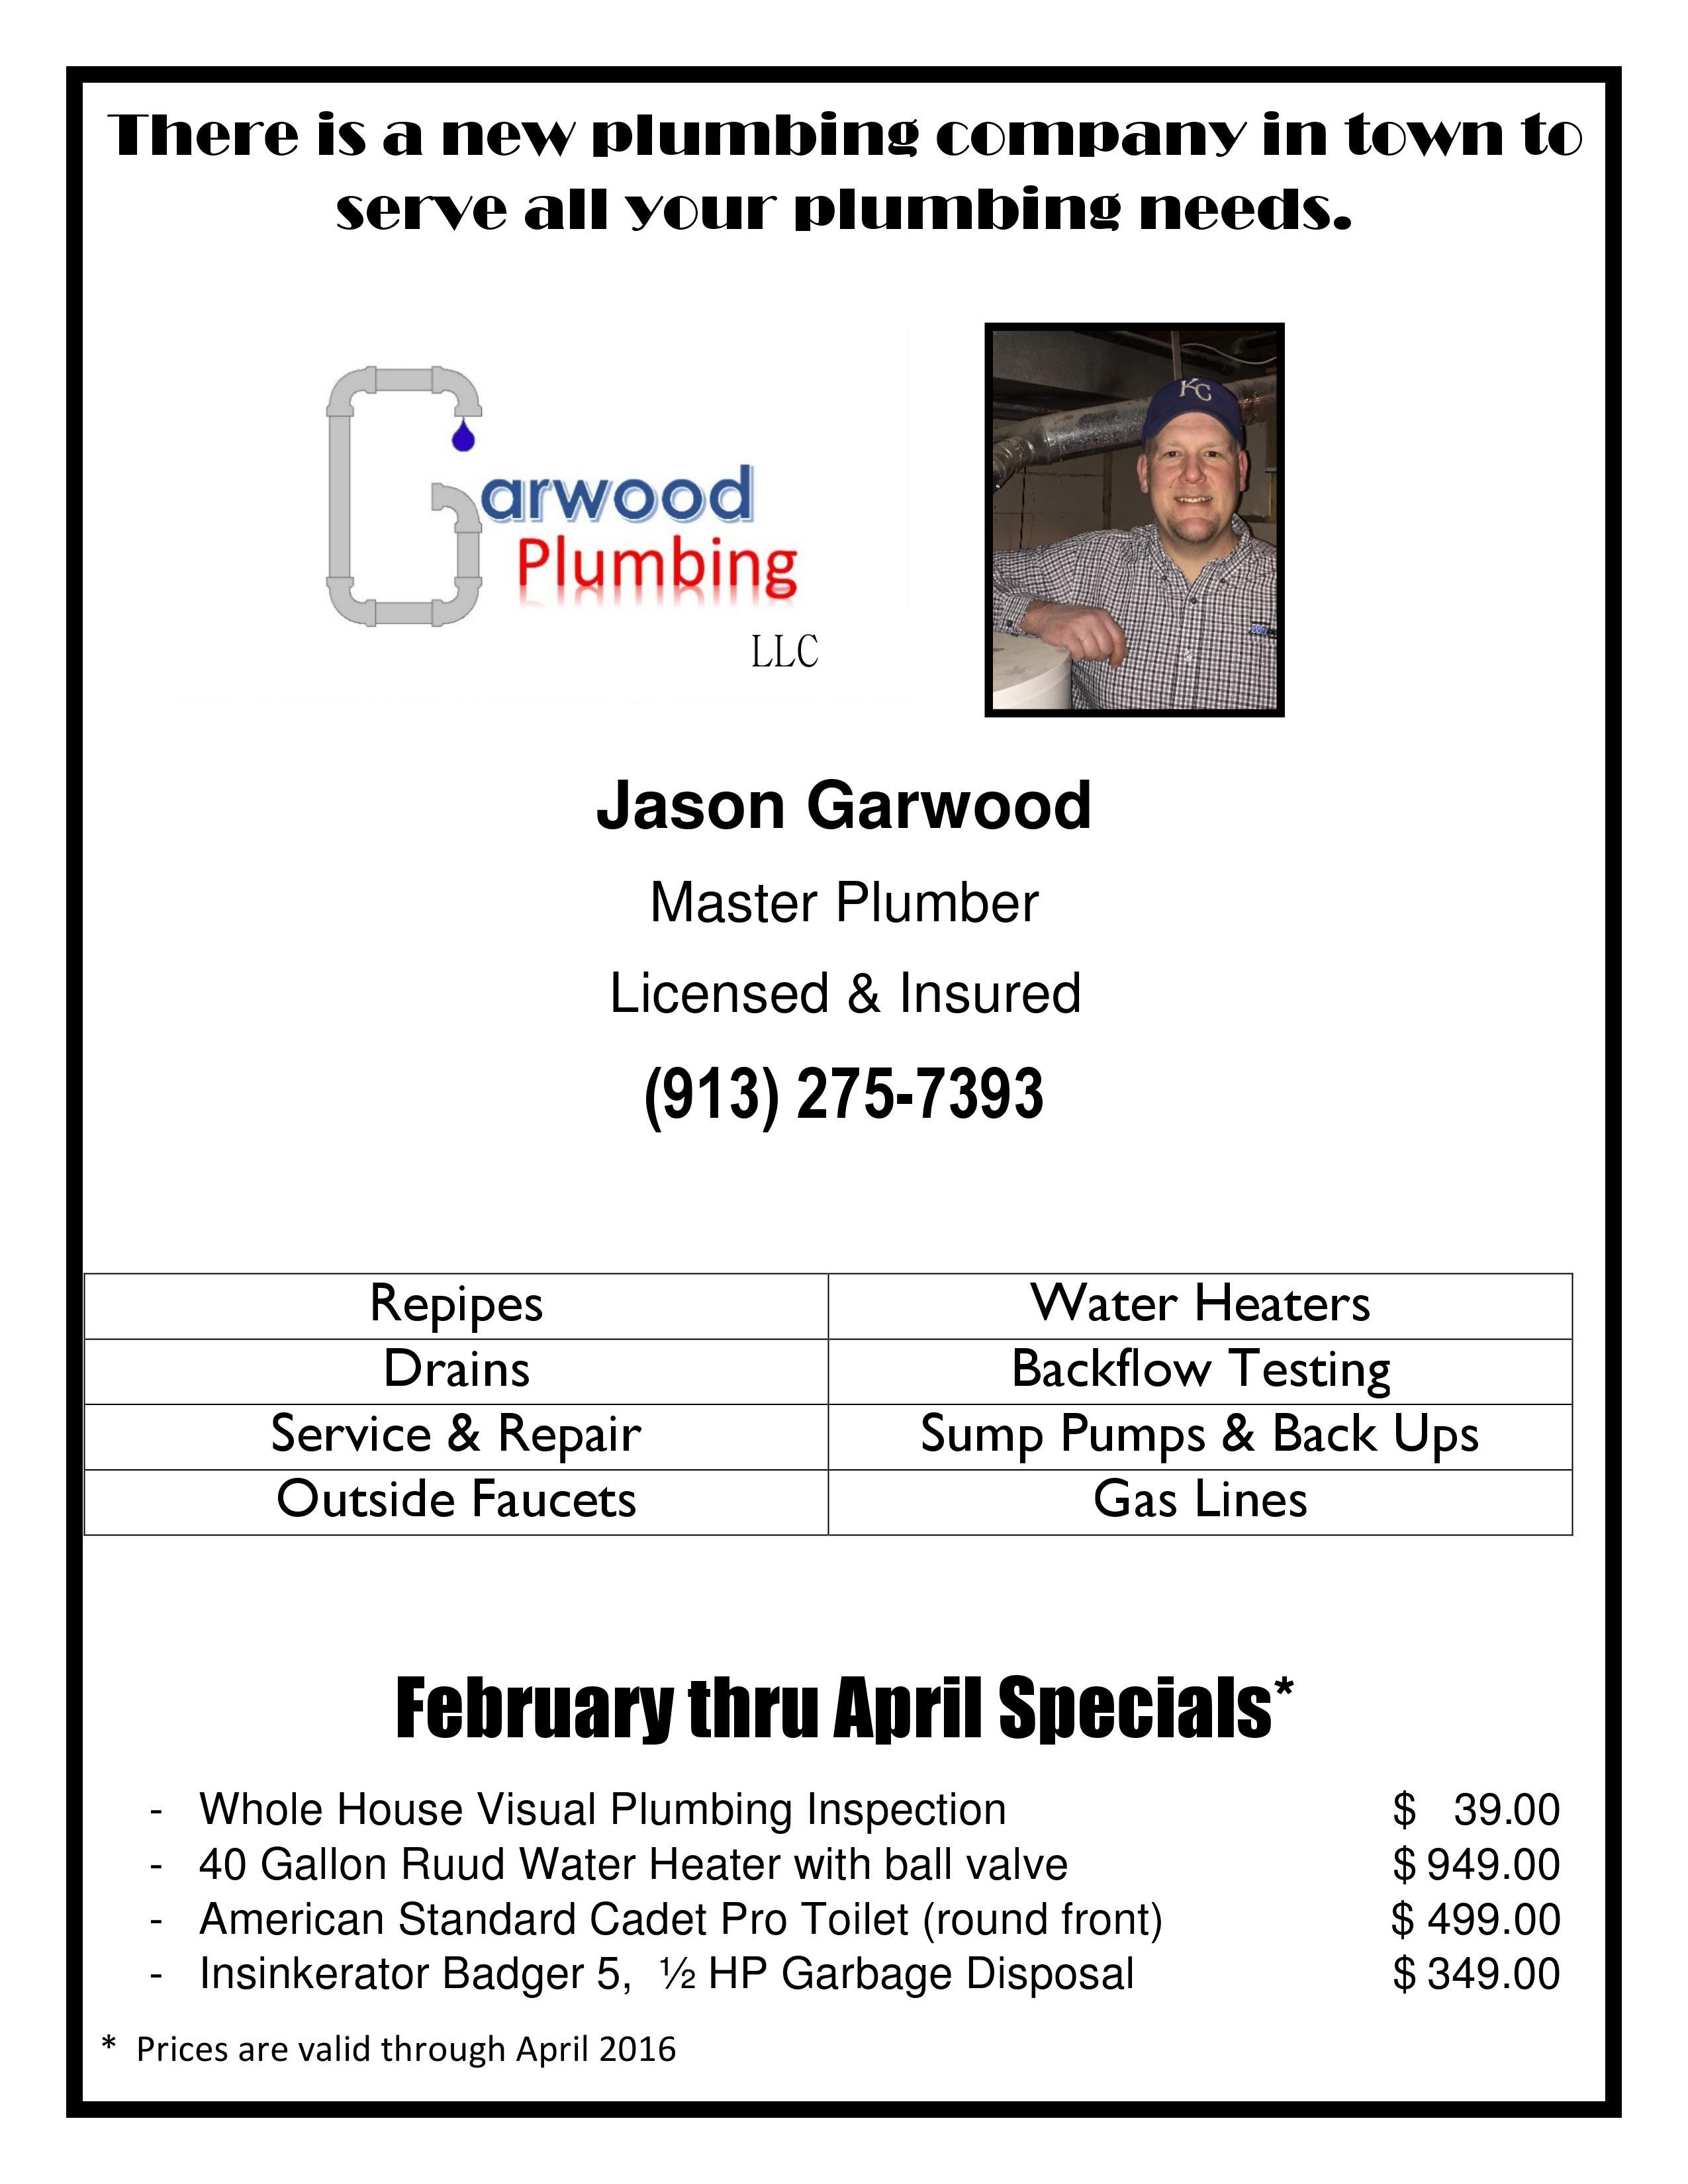 Garwood Plumbing LLC 8345 Riggs St, Overland Park, KS 66212 - YP.com